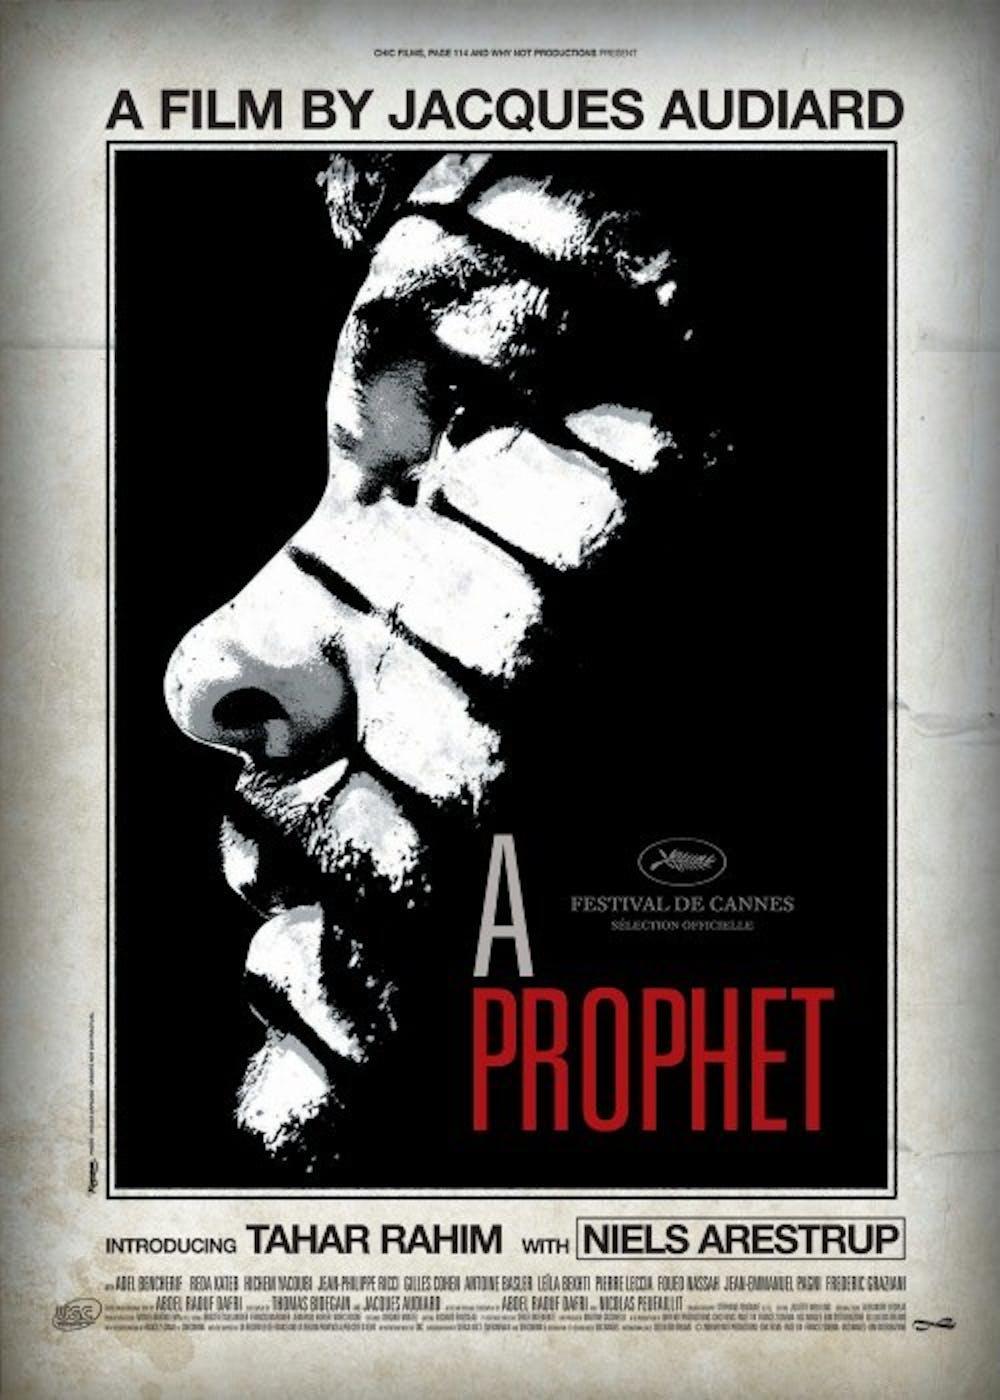 Movie Review: Un Prophete - The Daily Tar Heel